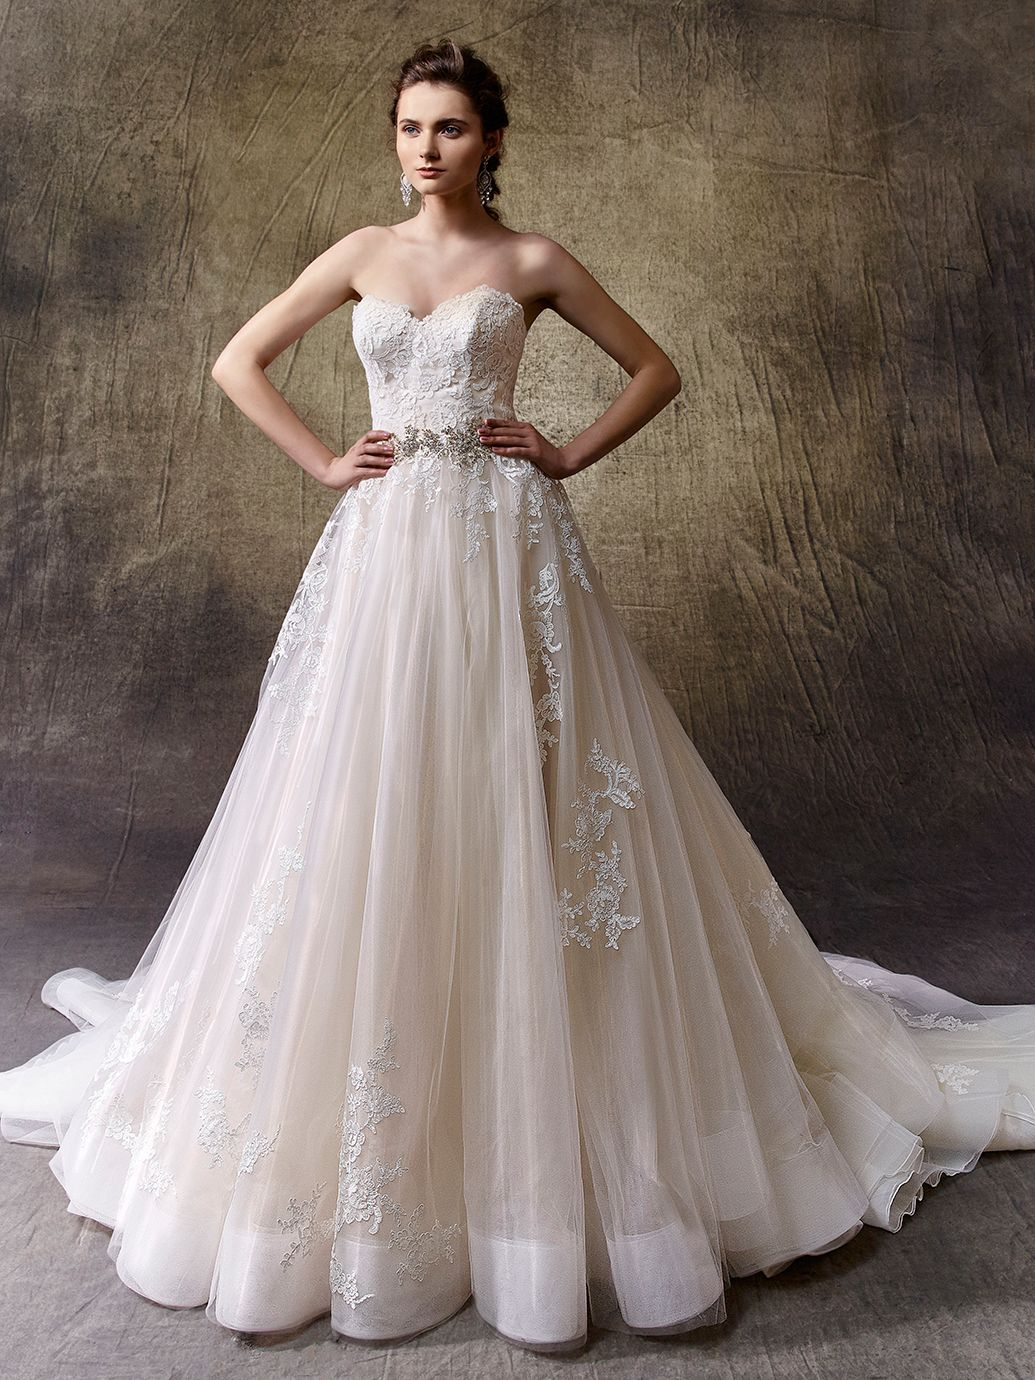 Blue by enzoani jadorie find top designer wedding dresses blue by enzoani jadorie find top designer wedding dresses bridal gowns at jaehee ombrellifo Choice Image